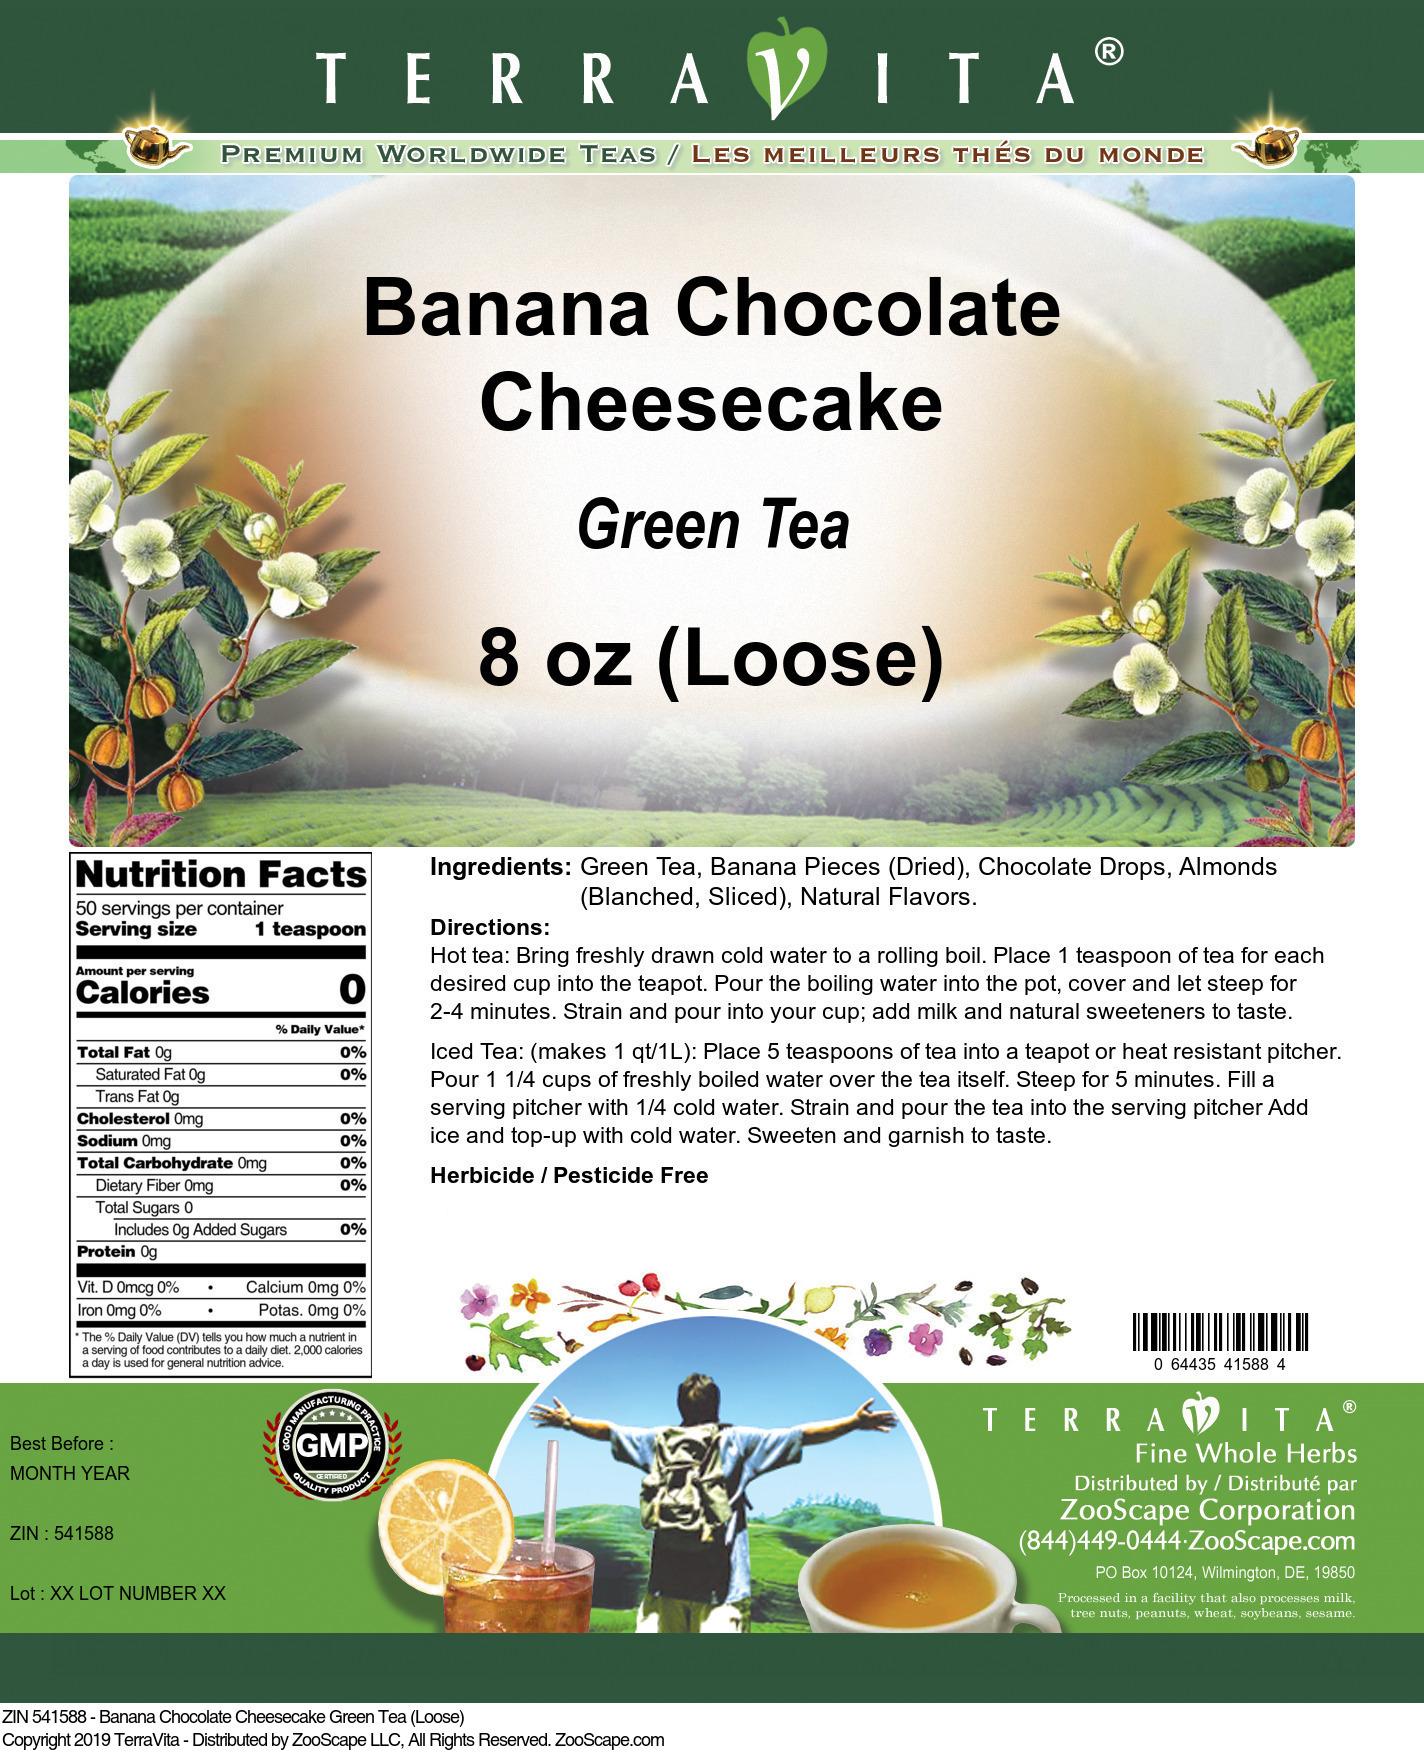 Banana Chocolate Cheesecake Green Tea